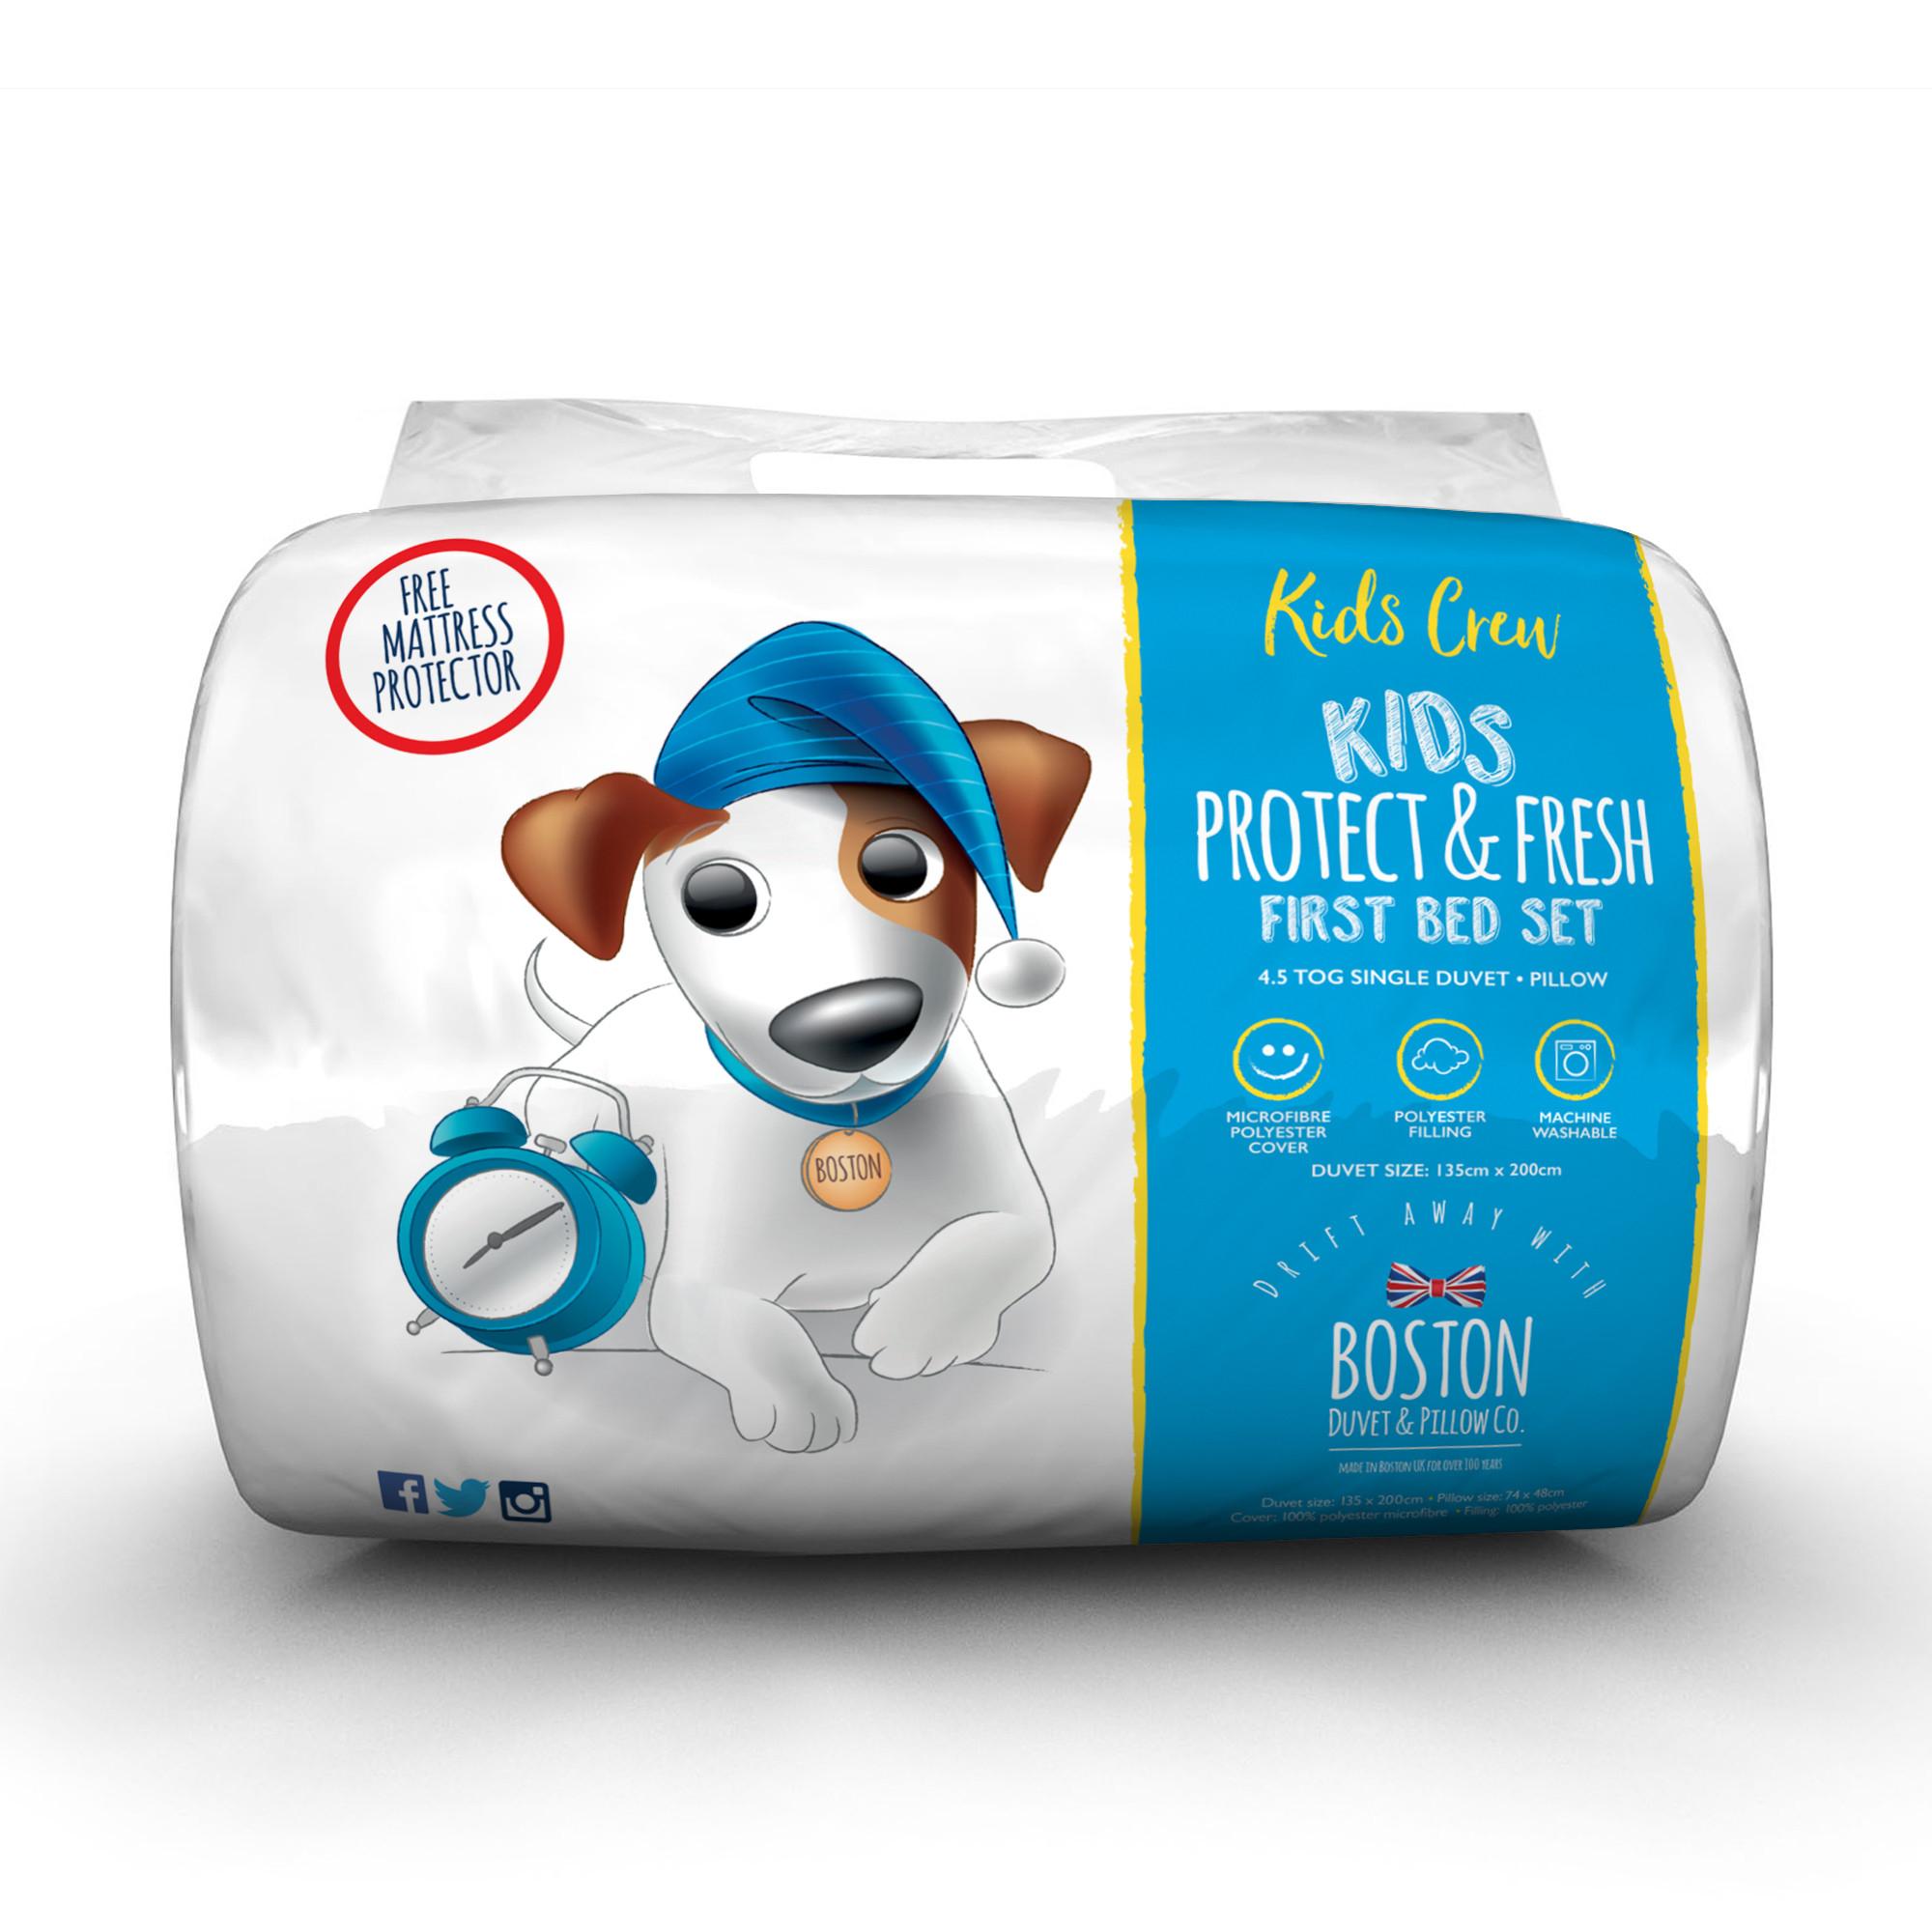 Boston Duvet & Pillow Co.Kids Crew Kids Hollow fibre Bed Set @ SleepSeeker £9.99 Delivered